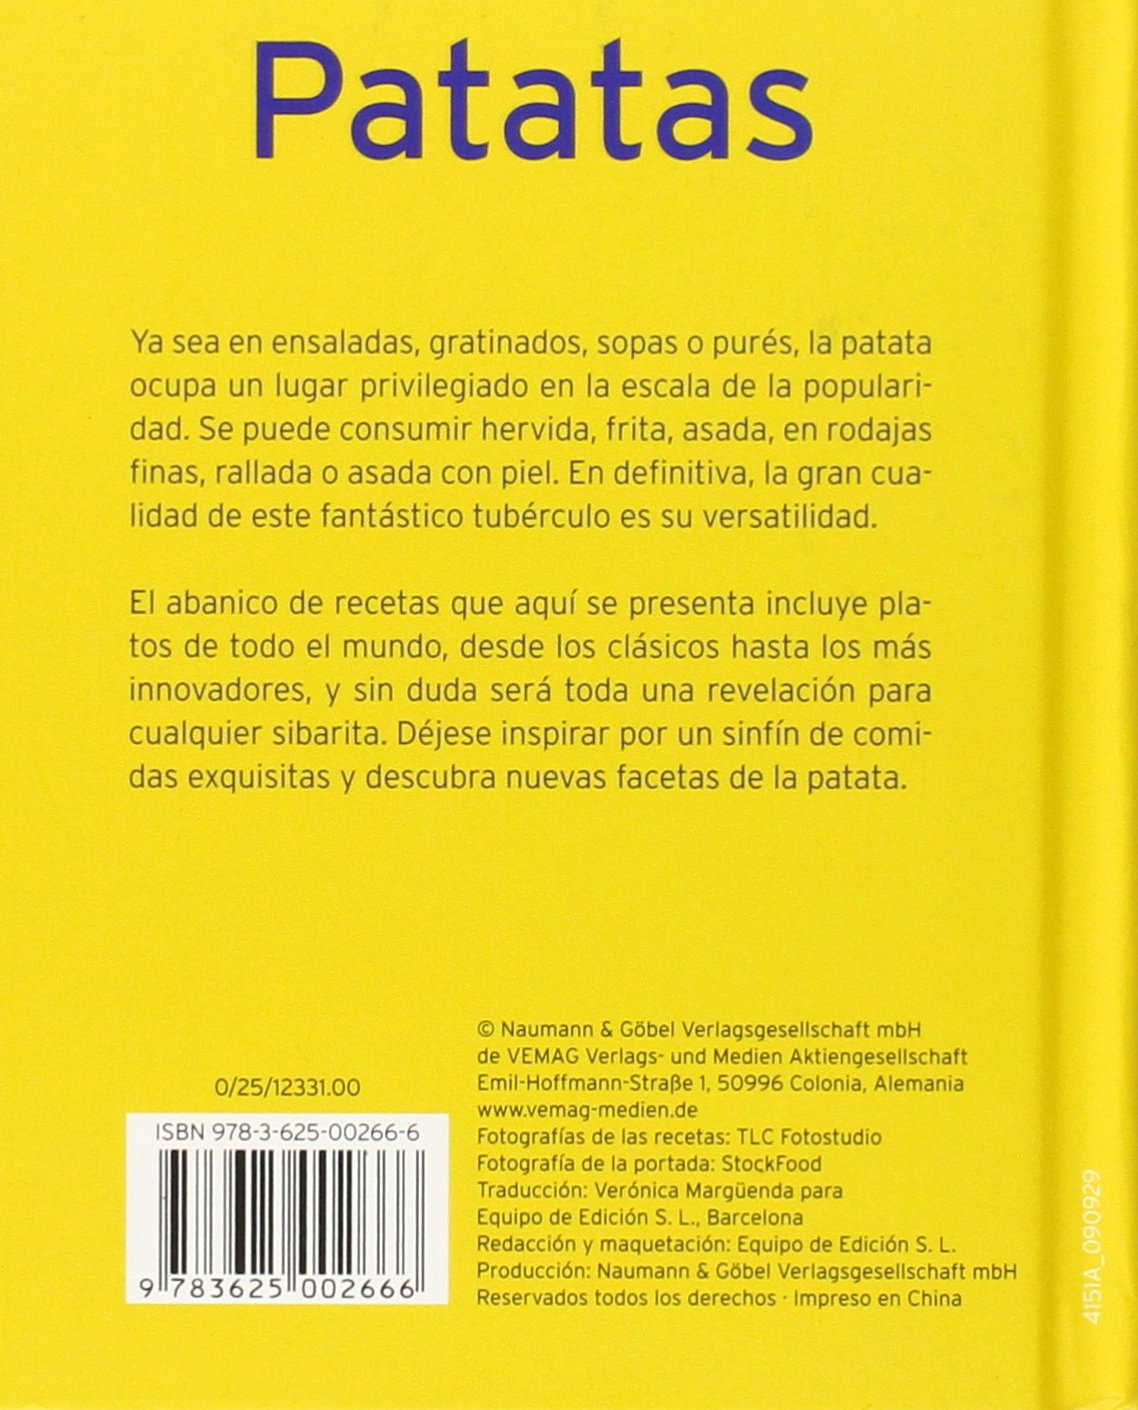 PATATAS:SENCILLAS, VERSTILES Y SIEMPRE APETITOSAS.(NGV): VV.AA.: 9783625002666: Amazon.com: Books